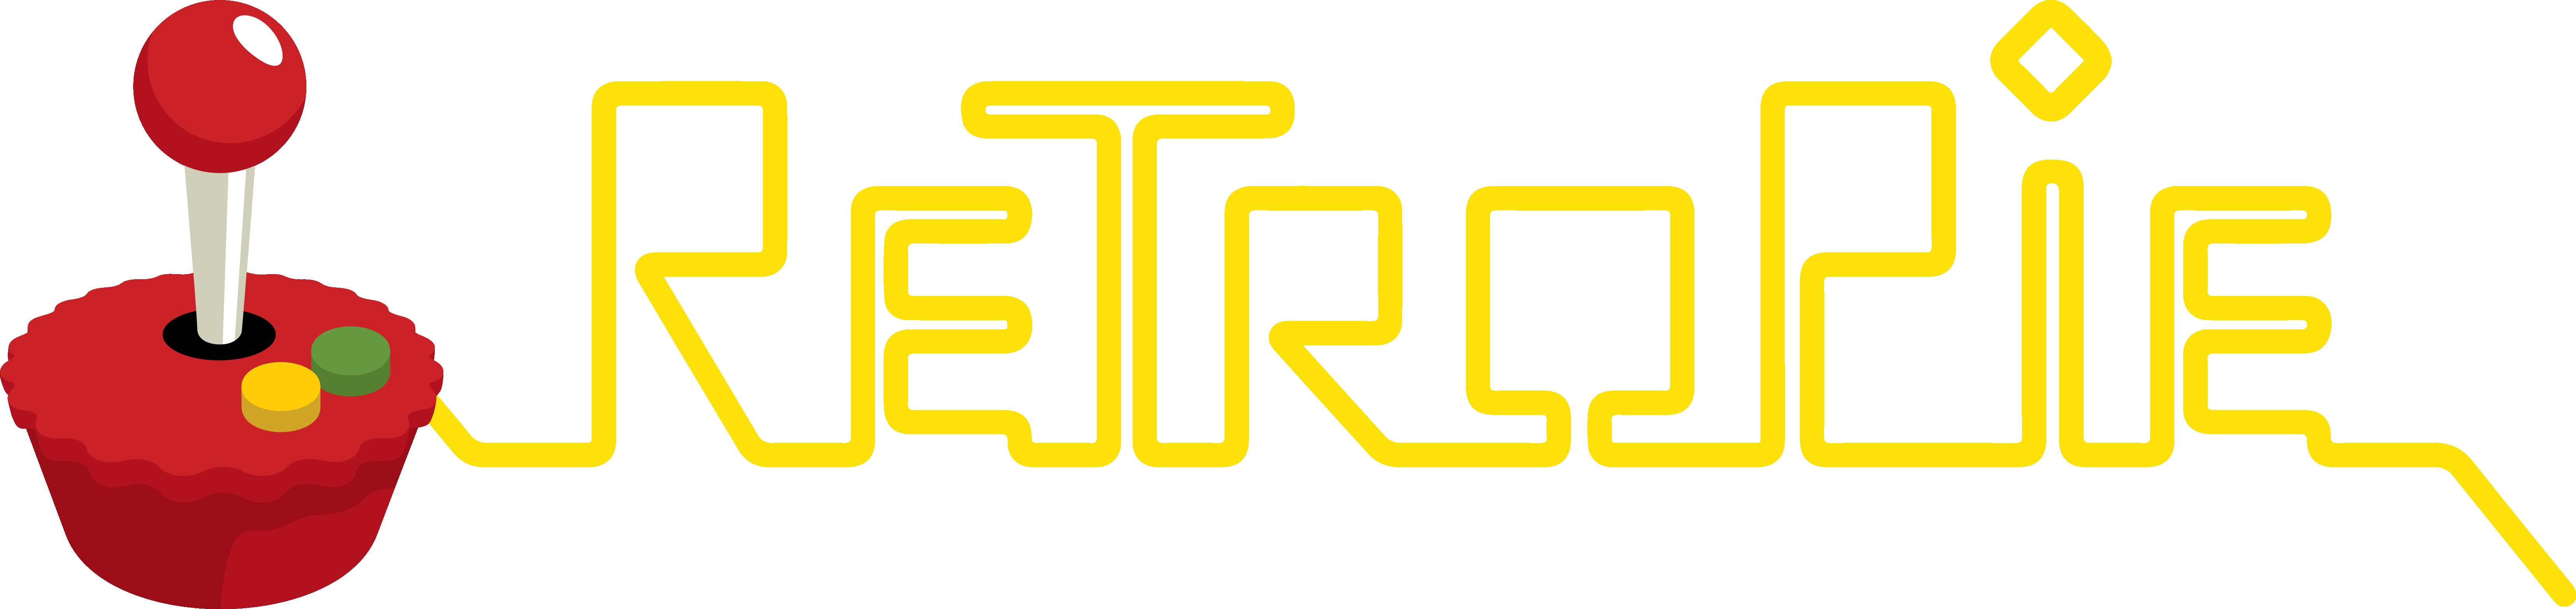 retropie-original-flat